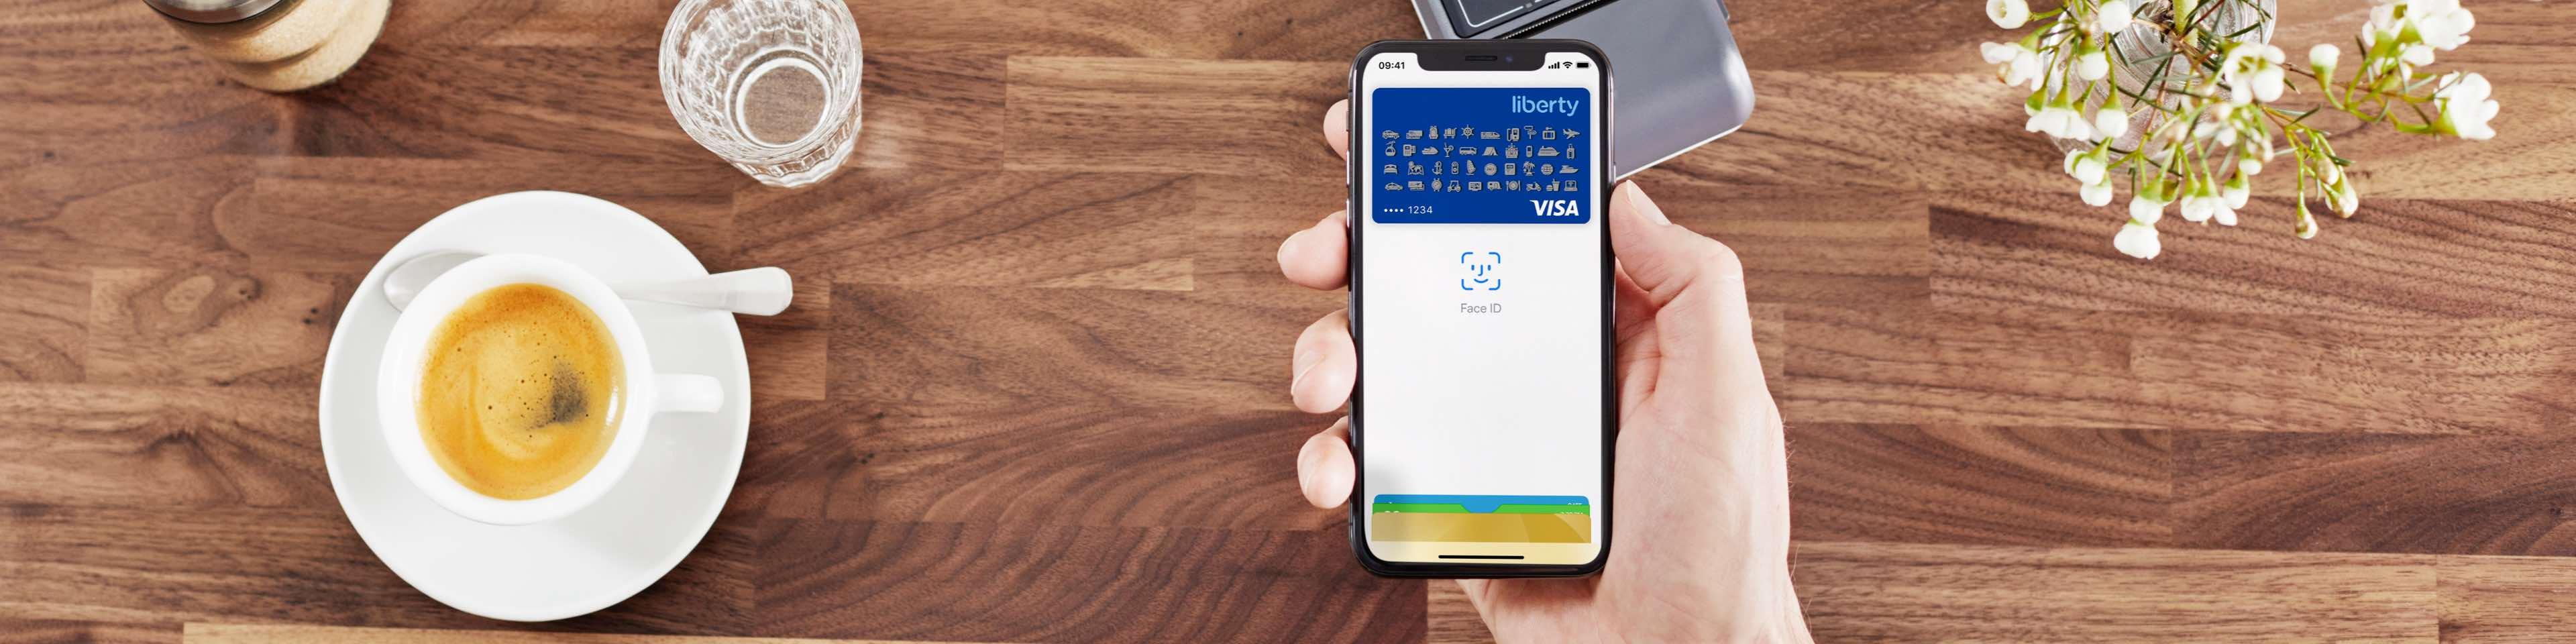 Mobile bezahlen